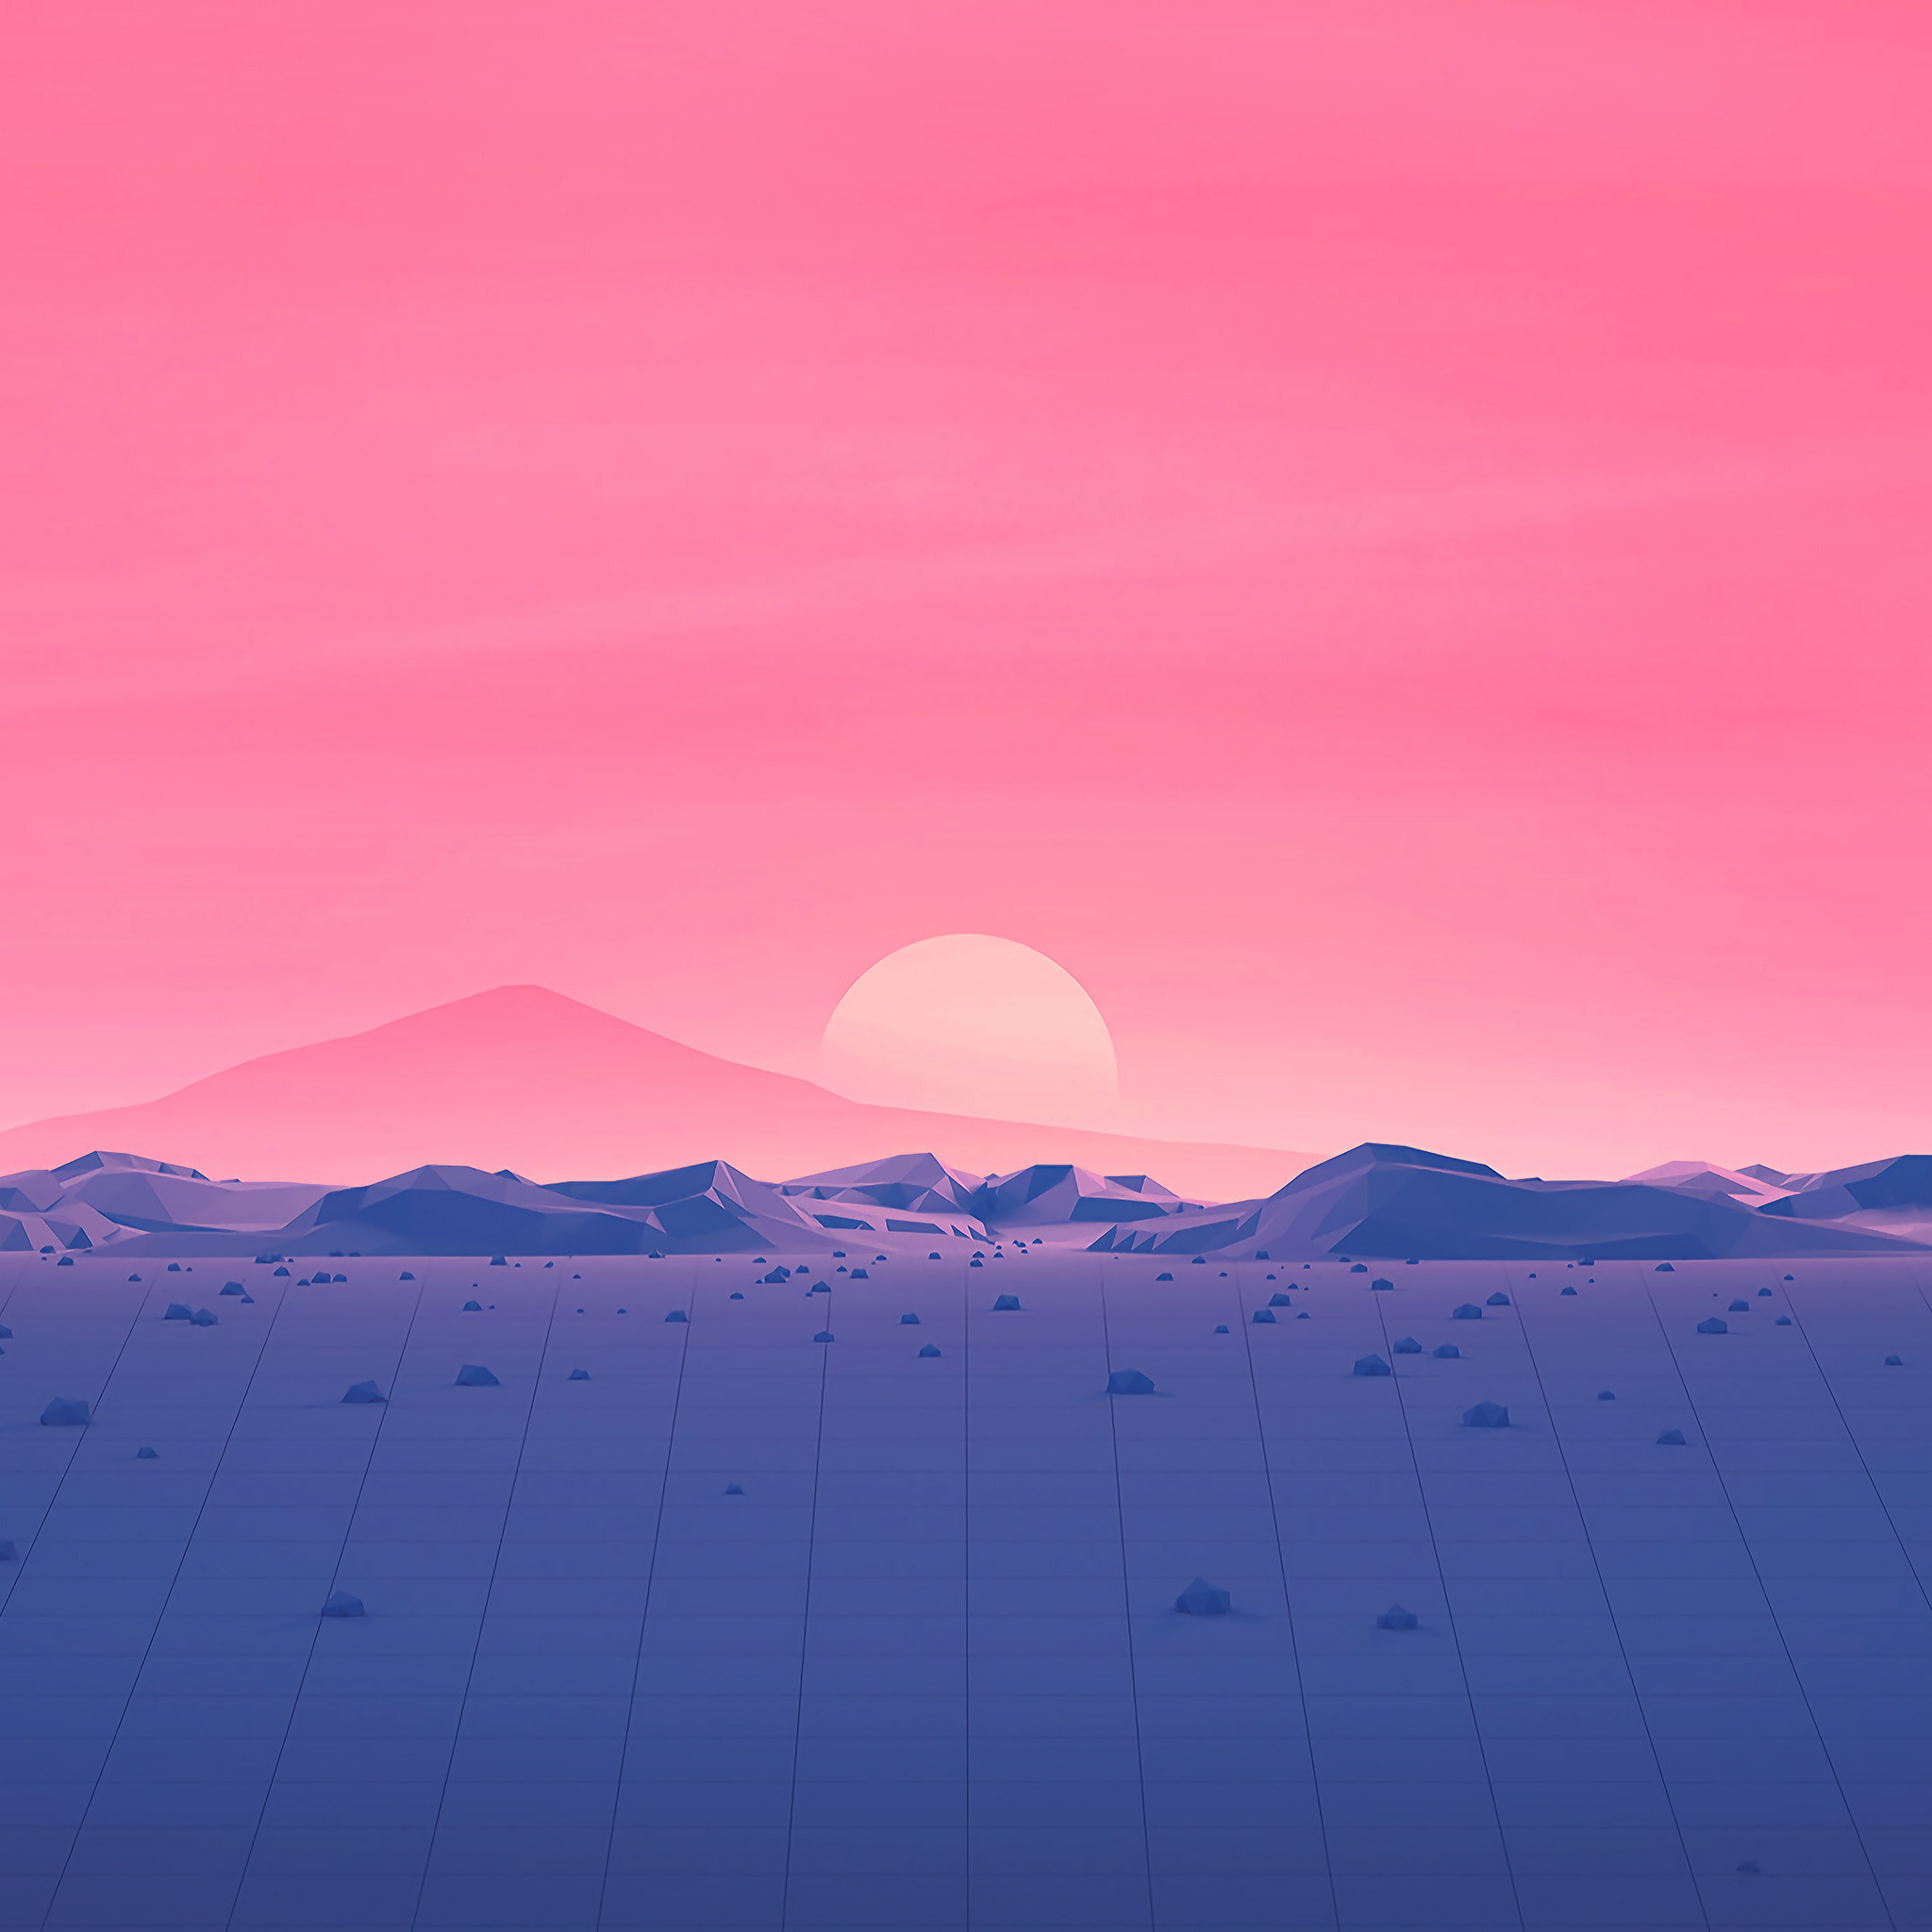 4k Resolution Wallpaper: 2048x2048 Hotizons Sunset Polygon Surface Mountains 4k